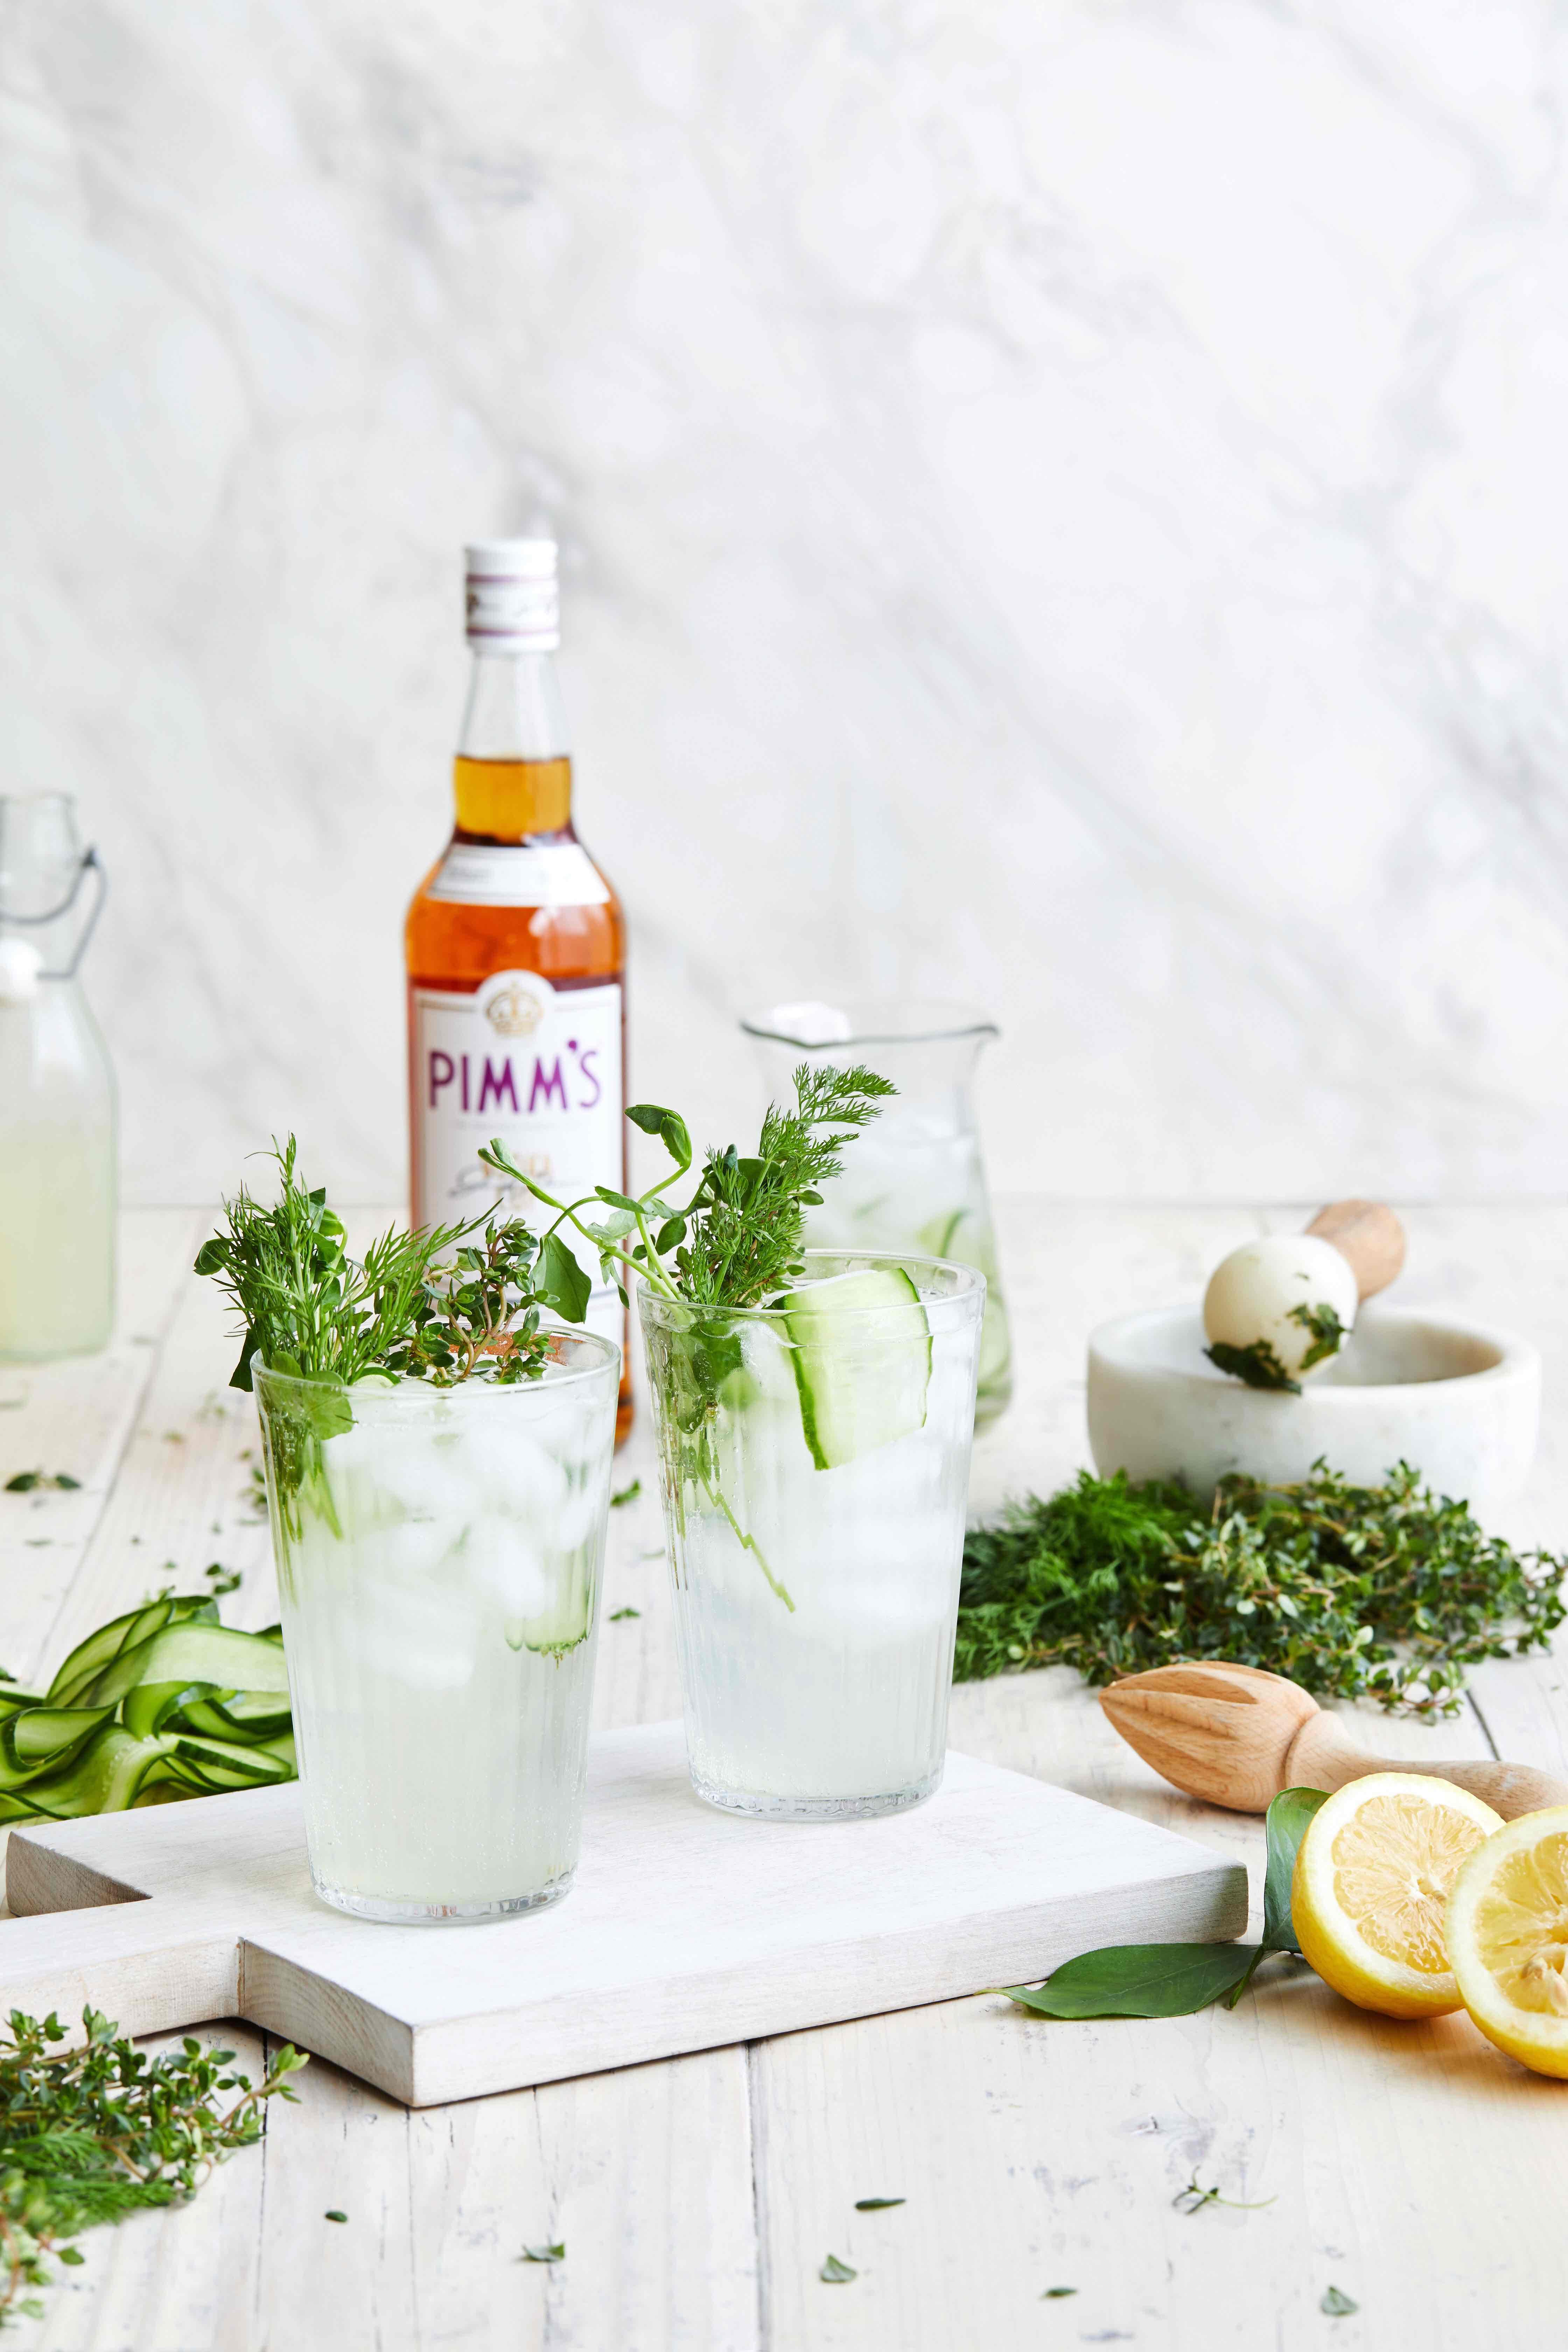 pimm's cocktail recipes, Pimm's Cocktail Recipes, Pimm's Cocktail Recipes for summer, Pimms Cocktail Recipes, Pimms Cocktail Recipes for summer